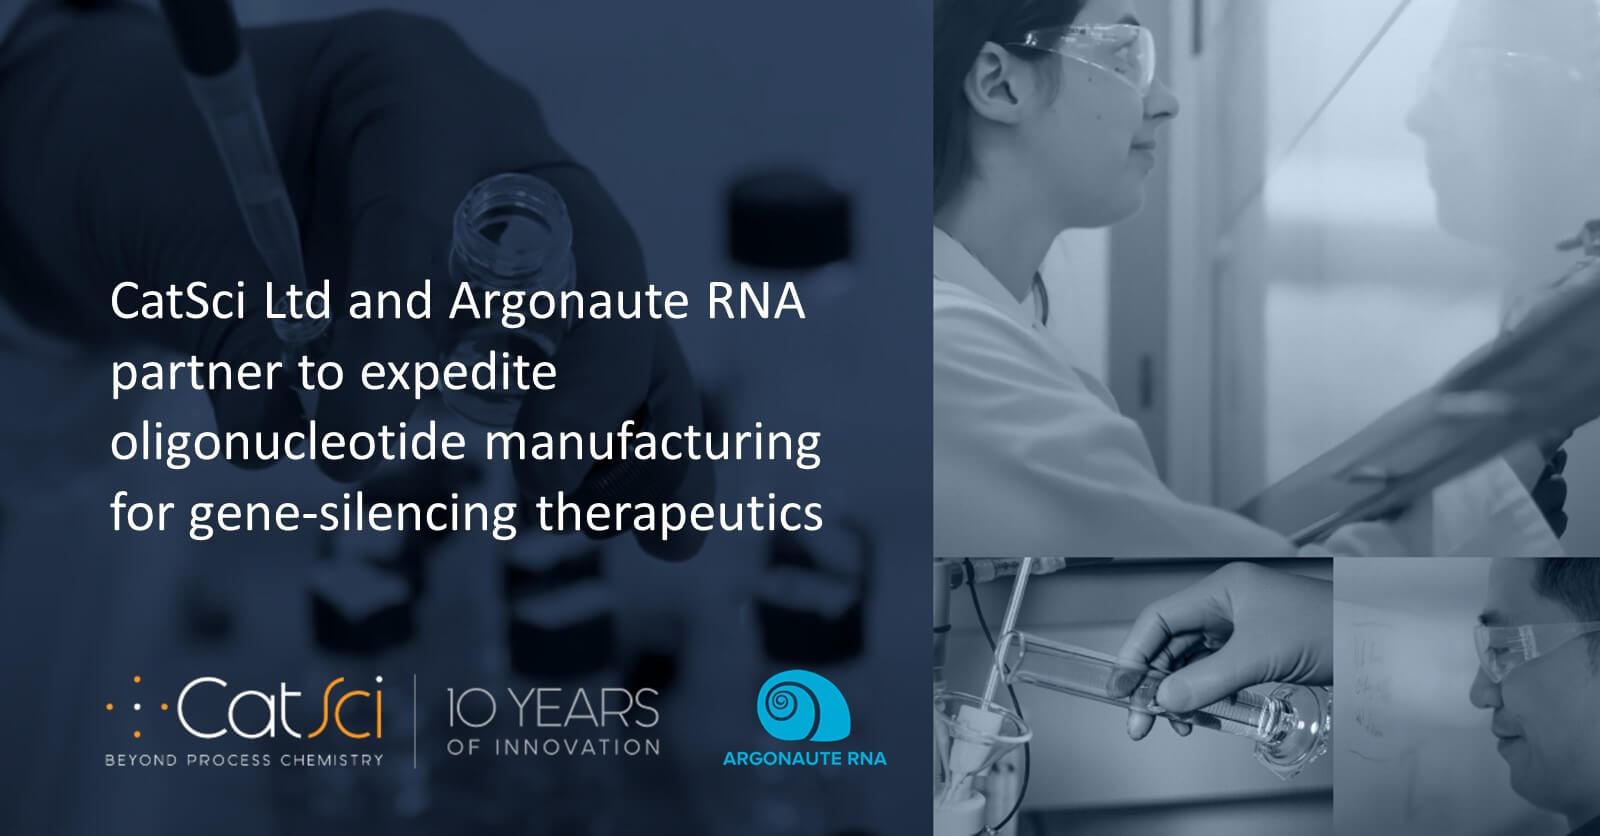 CatSci and Argonaute RNA partner to expedite oligonucleotide manufacturing for gene-silencing therapeutics